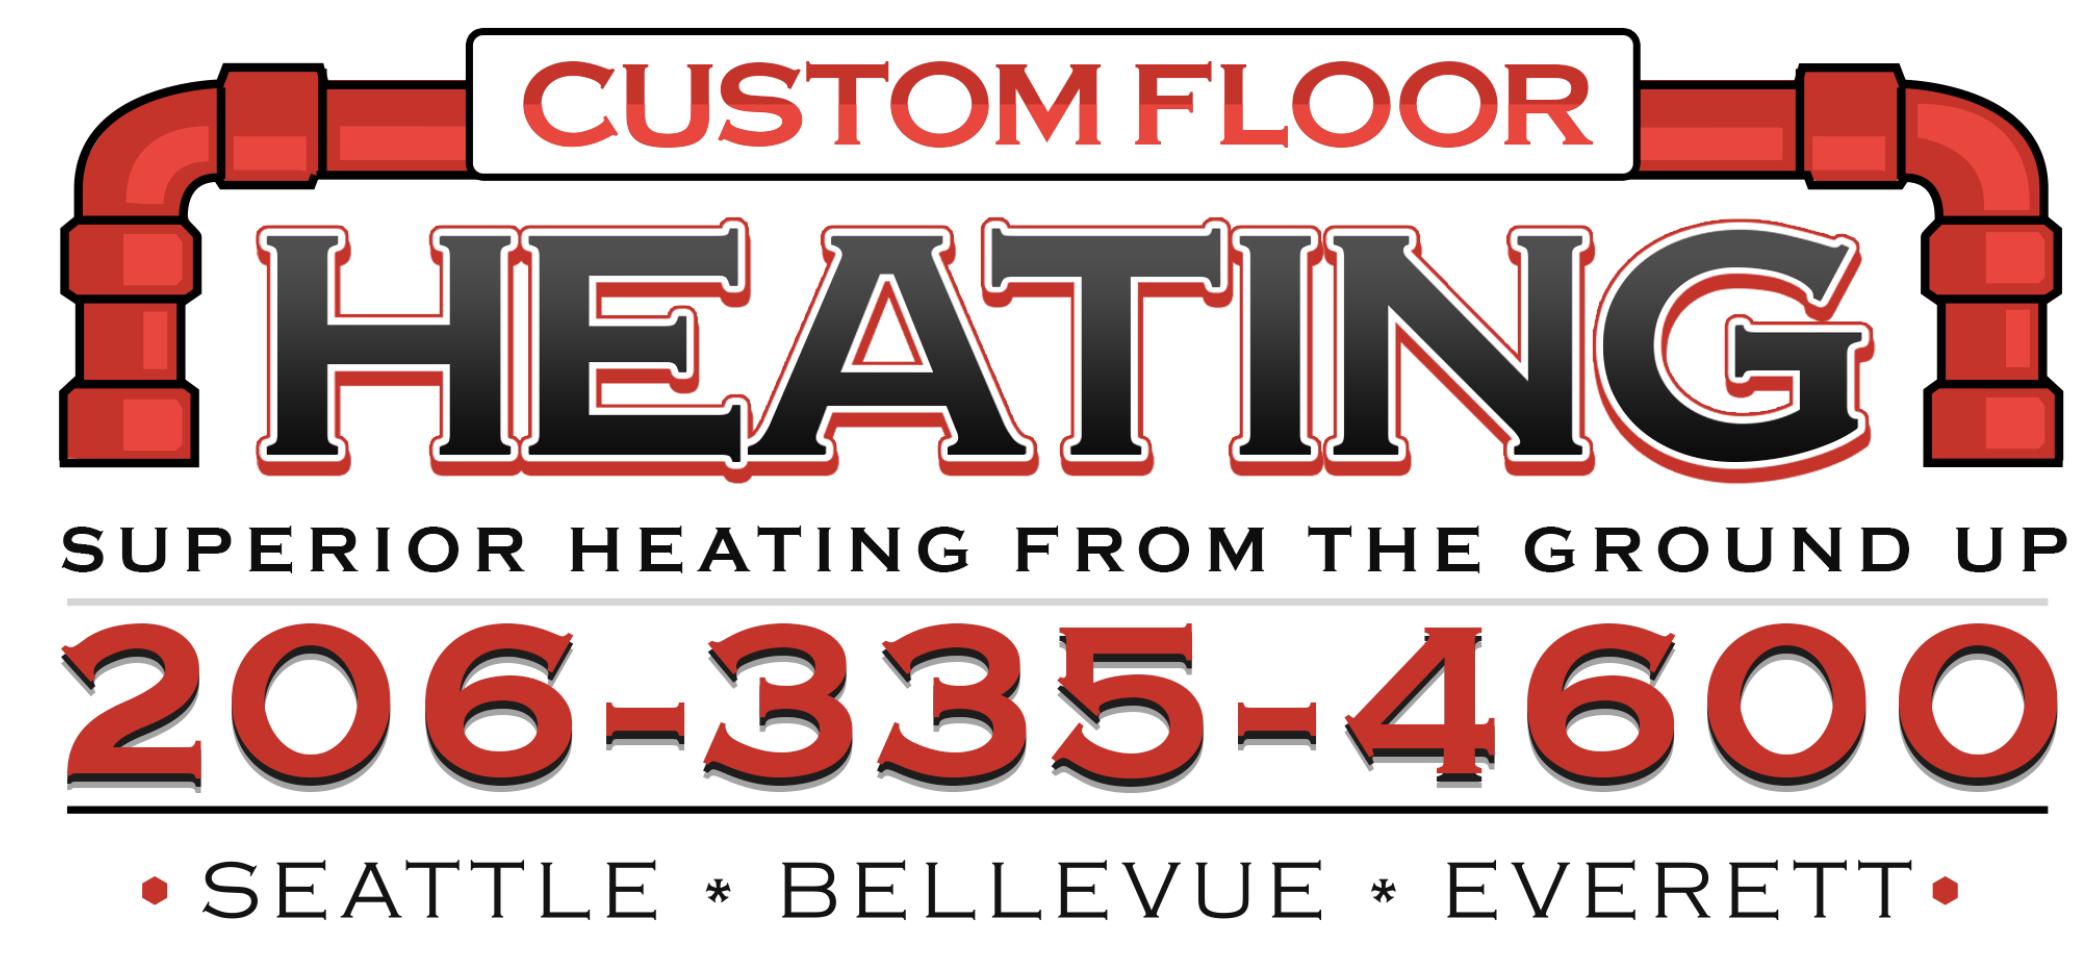 Custom Floor Heating